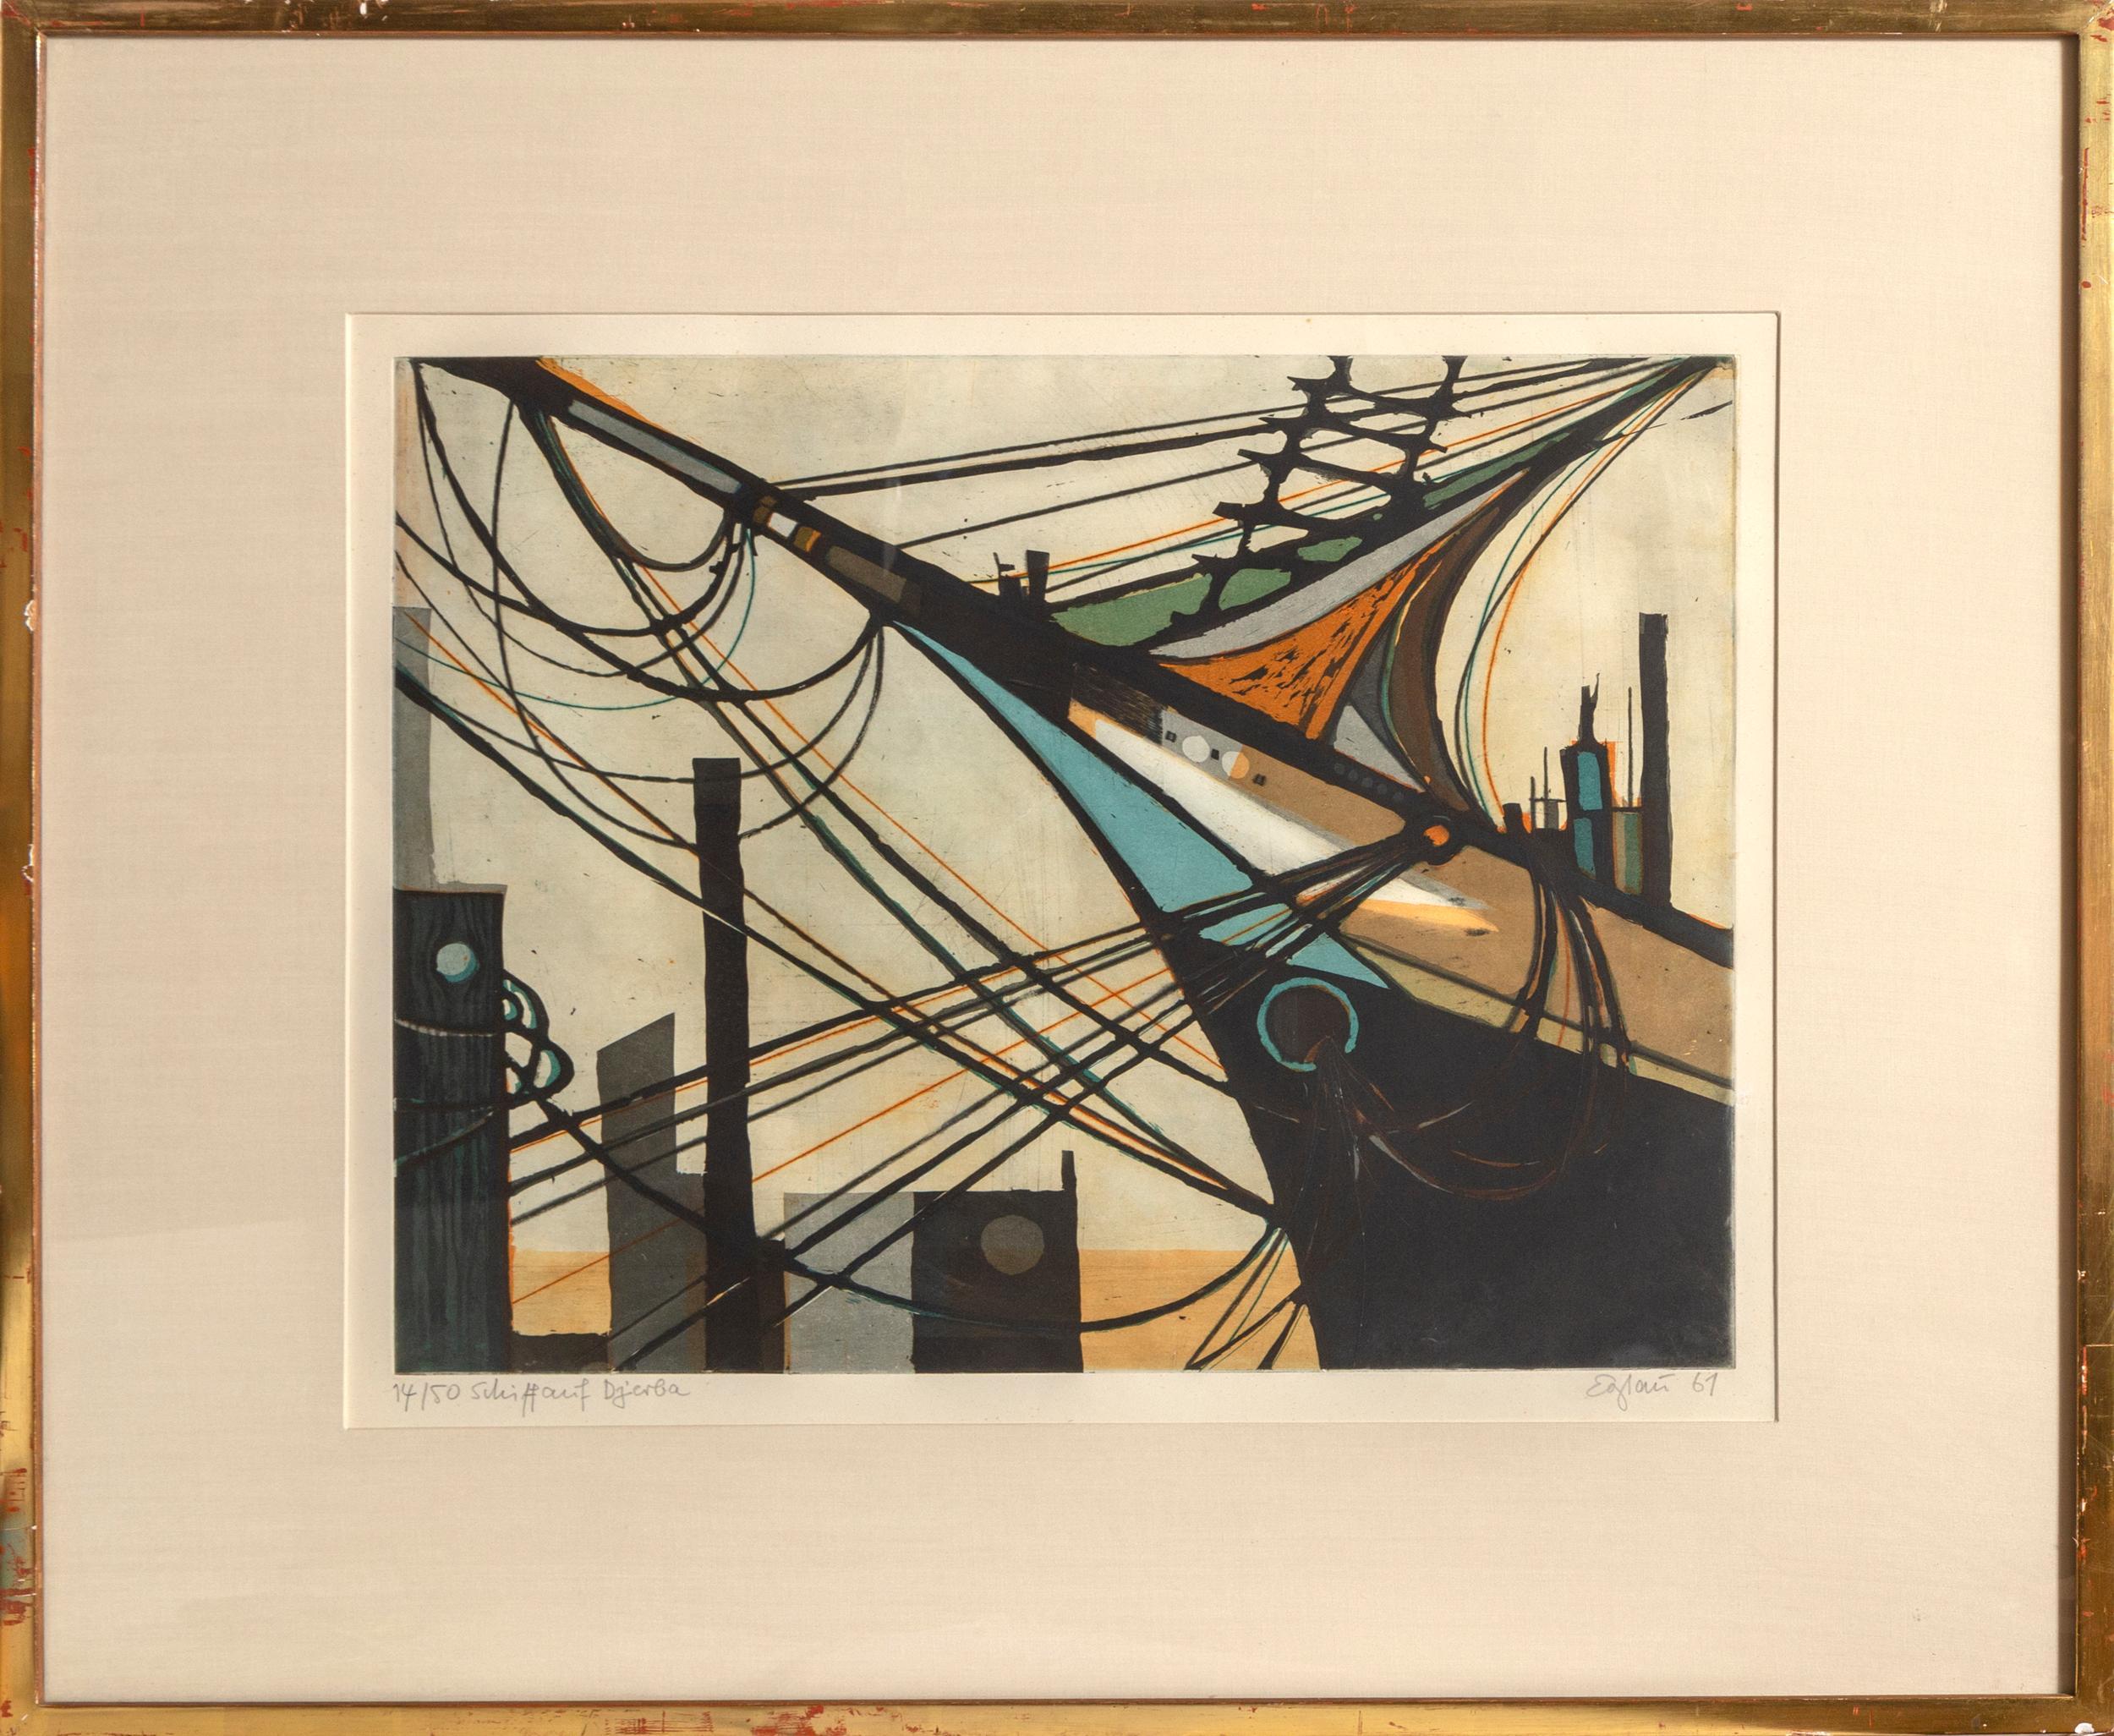 Otto Wilhelm Eglau, Schiff auf Djerba (Ship on Djerba), Color etching, aquatint, and drypoint